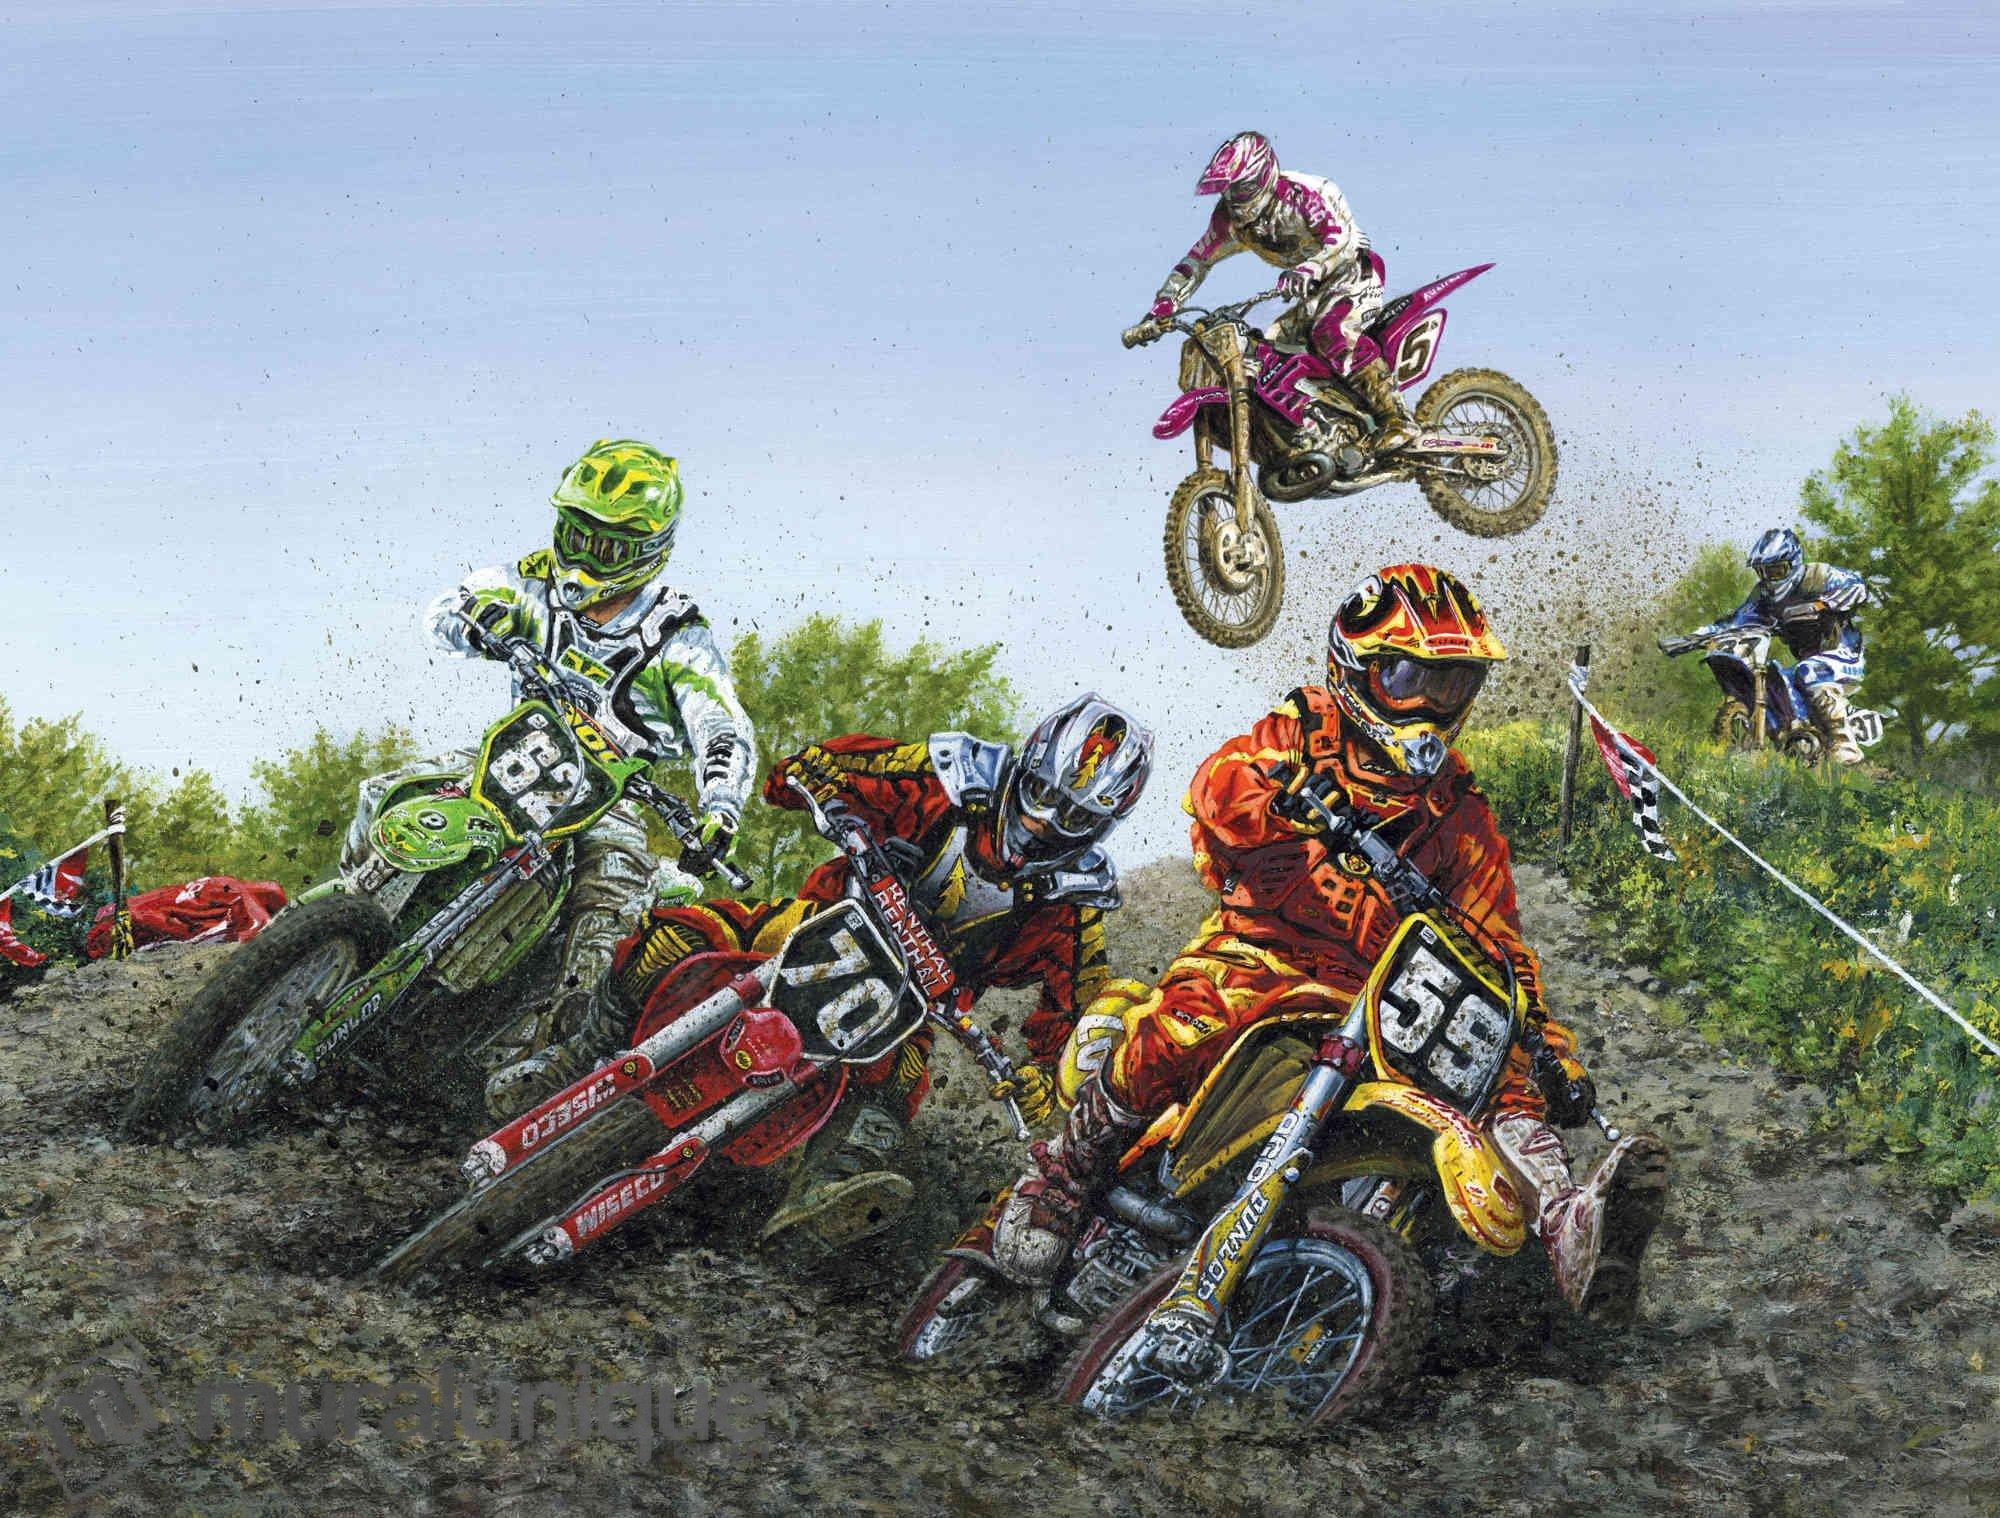 dirtbike motocross moto bike extreme motorbike dirt wallpaper dirtbike motocross moto bike extreme motorbike dirt wallpaper 2000x1518 311028 wallpaperup